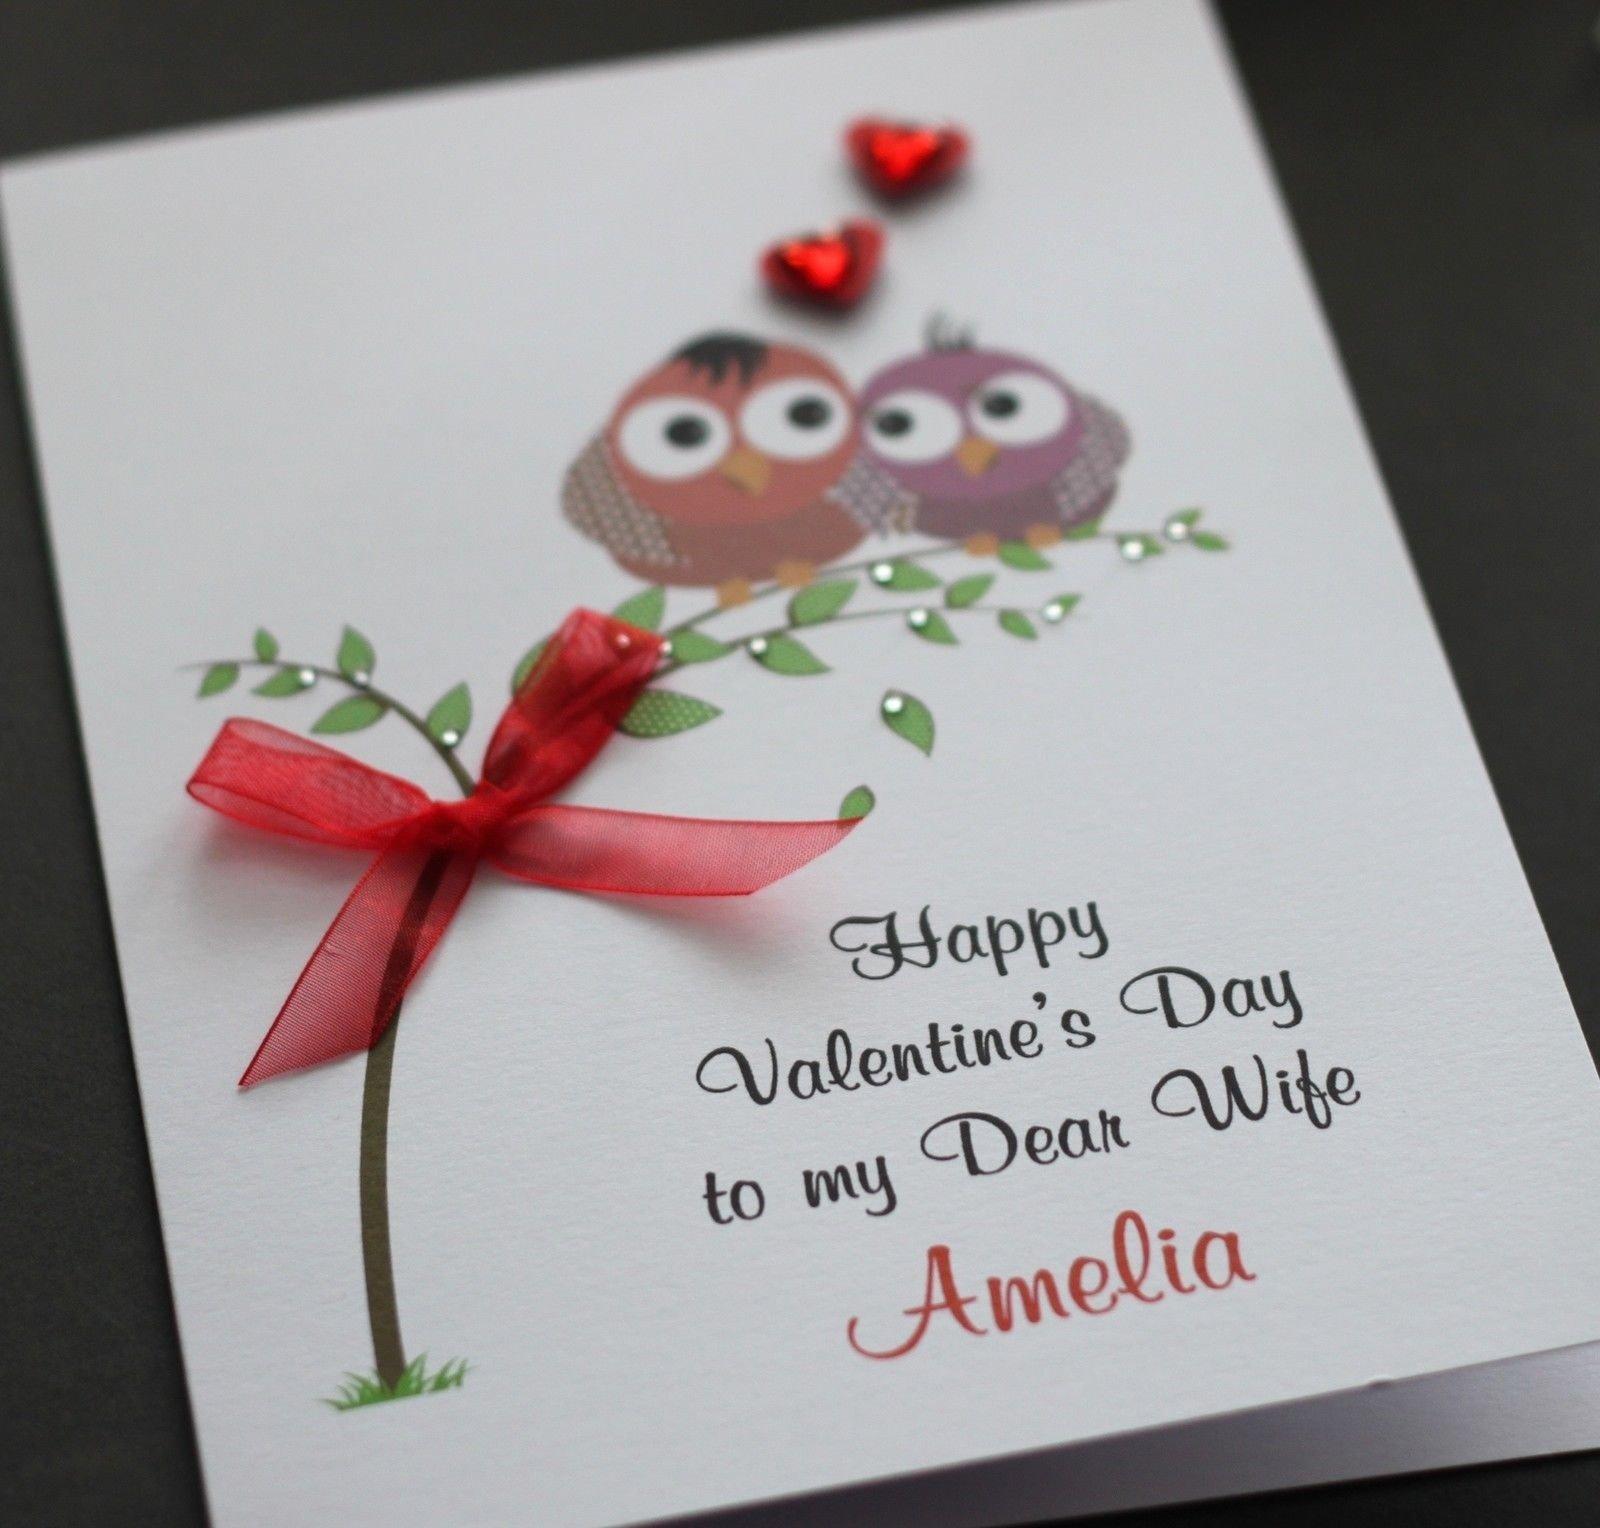 10 Unique Cute Card Ideas For Boyfriend